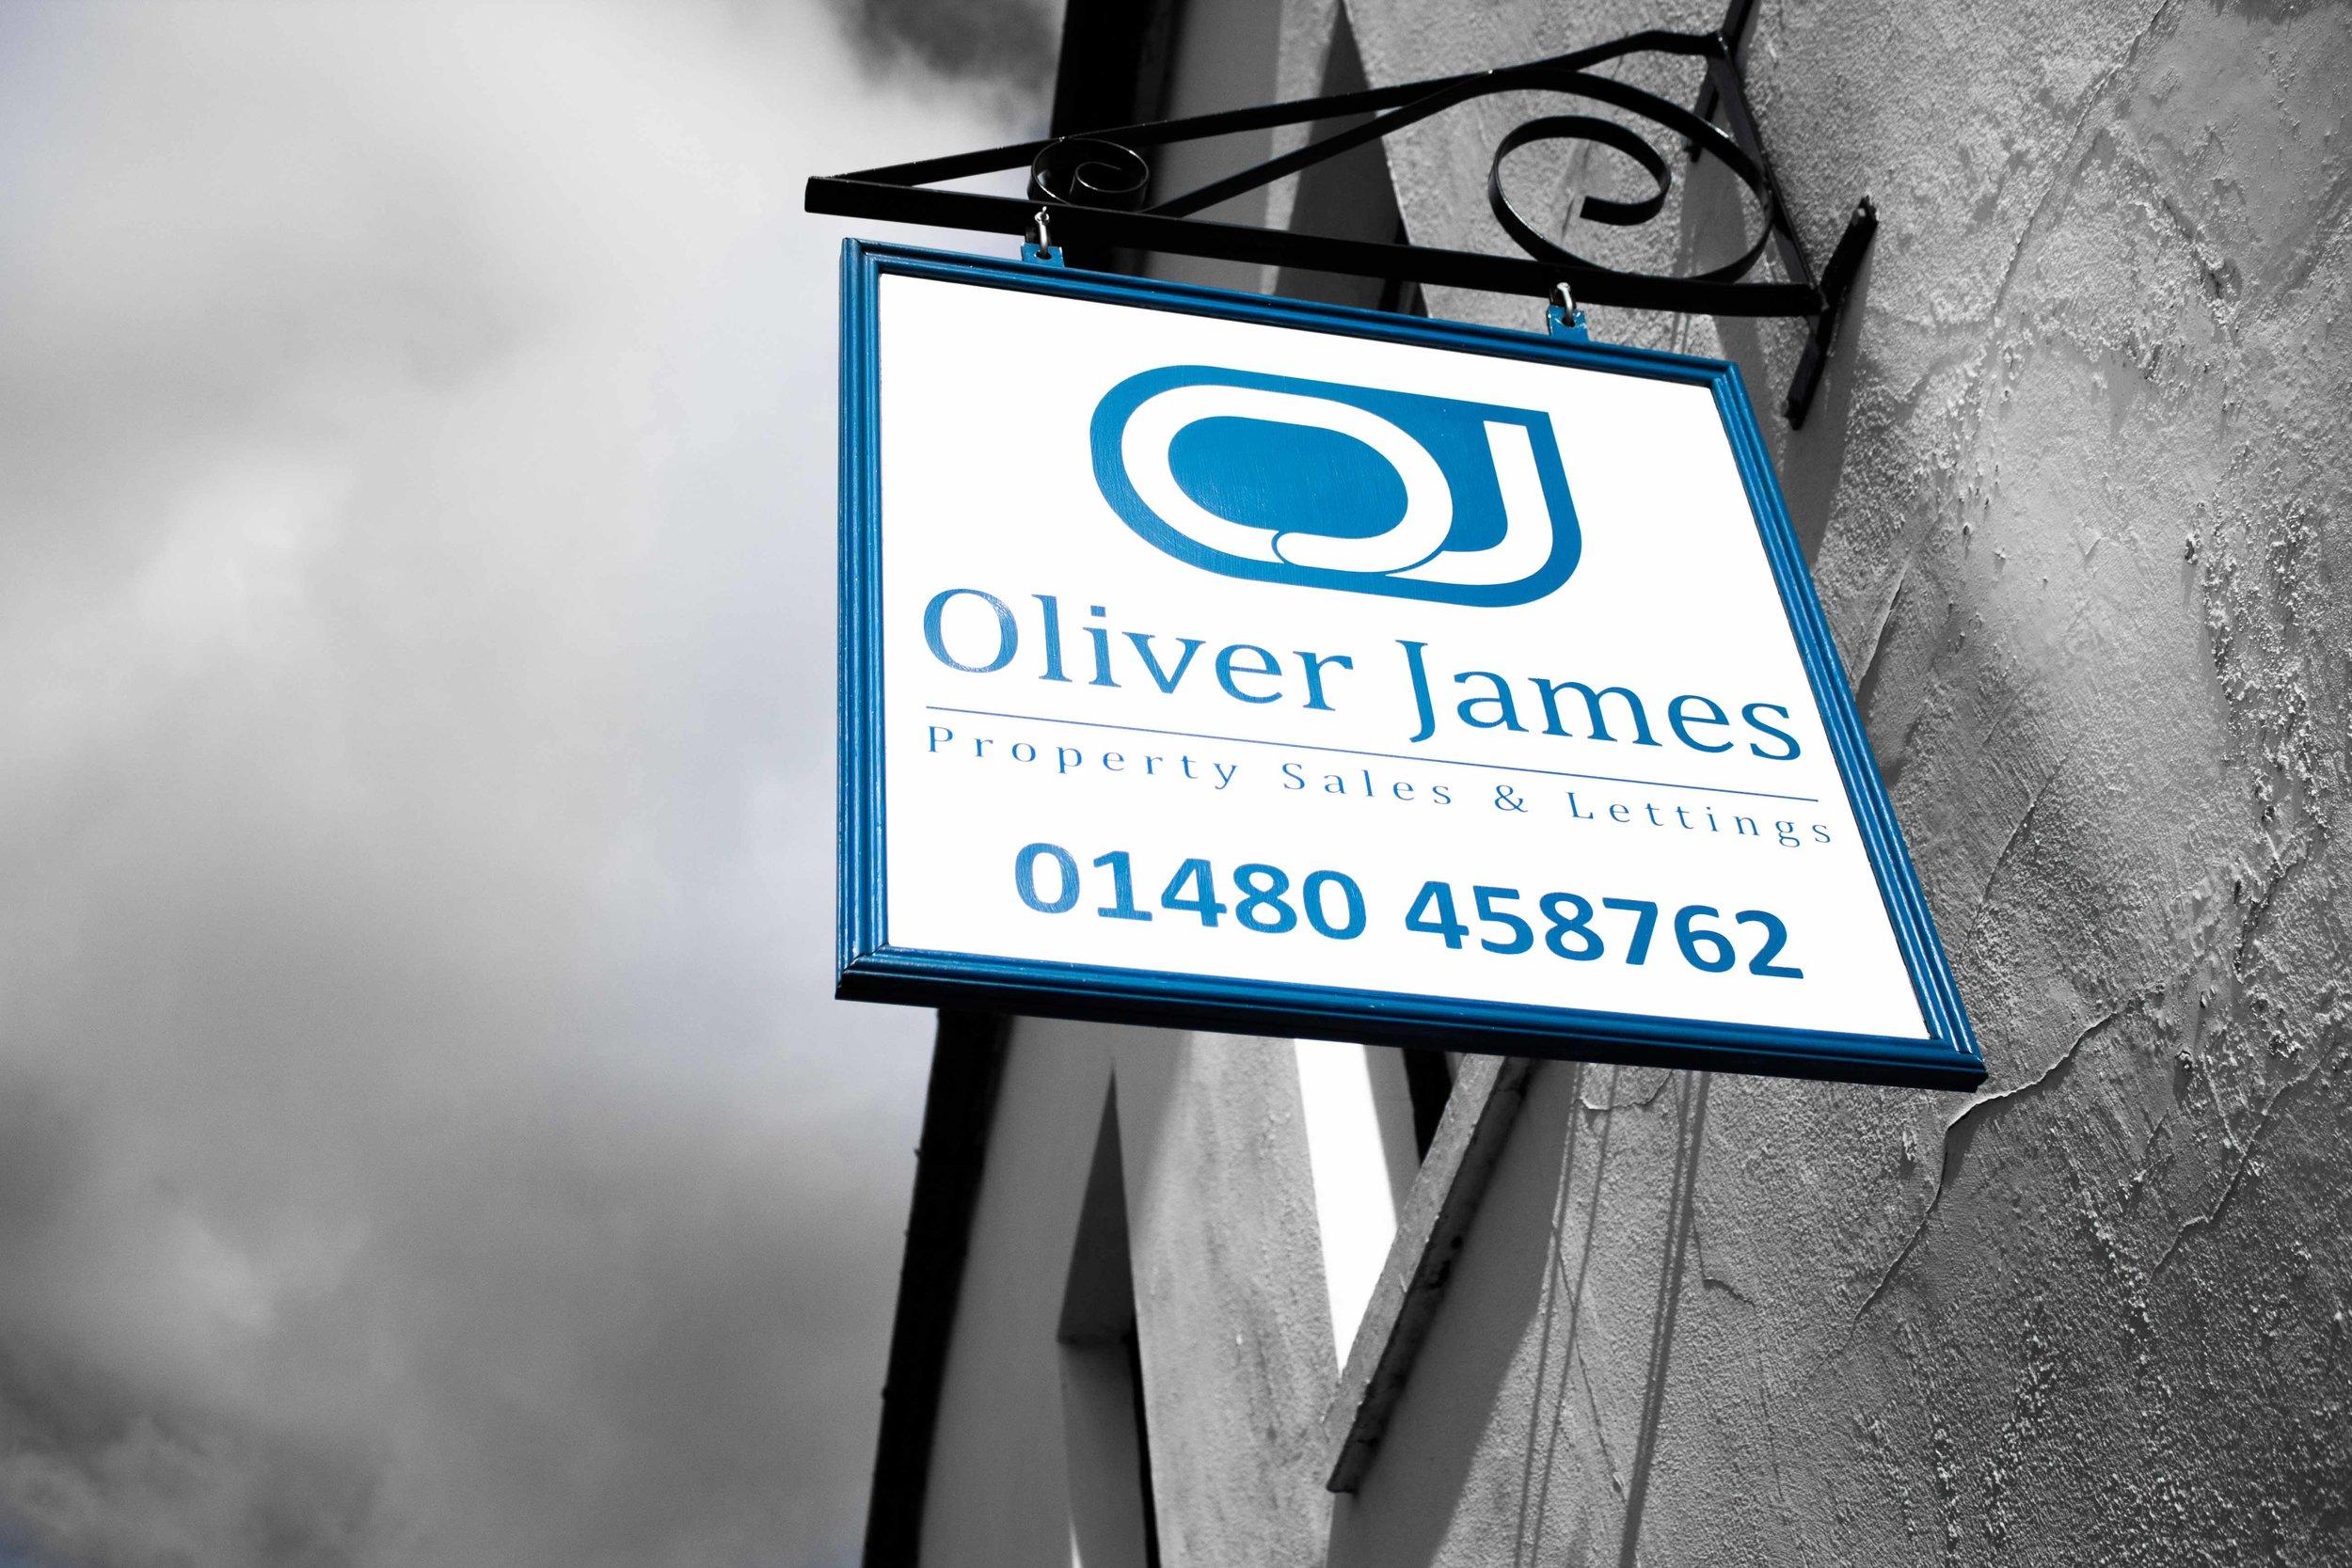 Oliver James - 07 - Colour - Lo Res.jpg